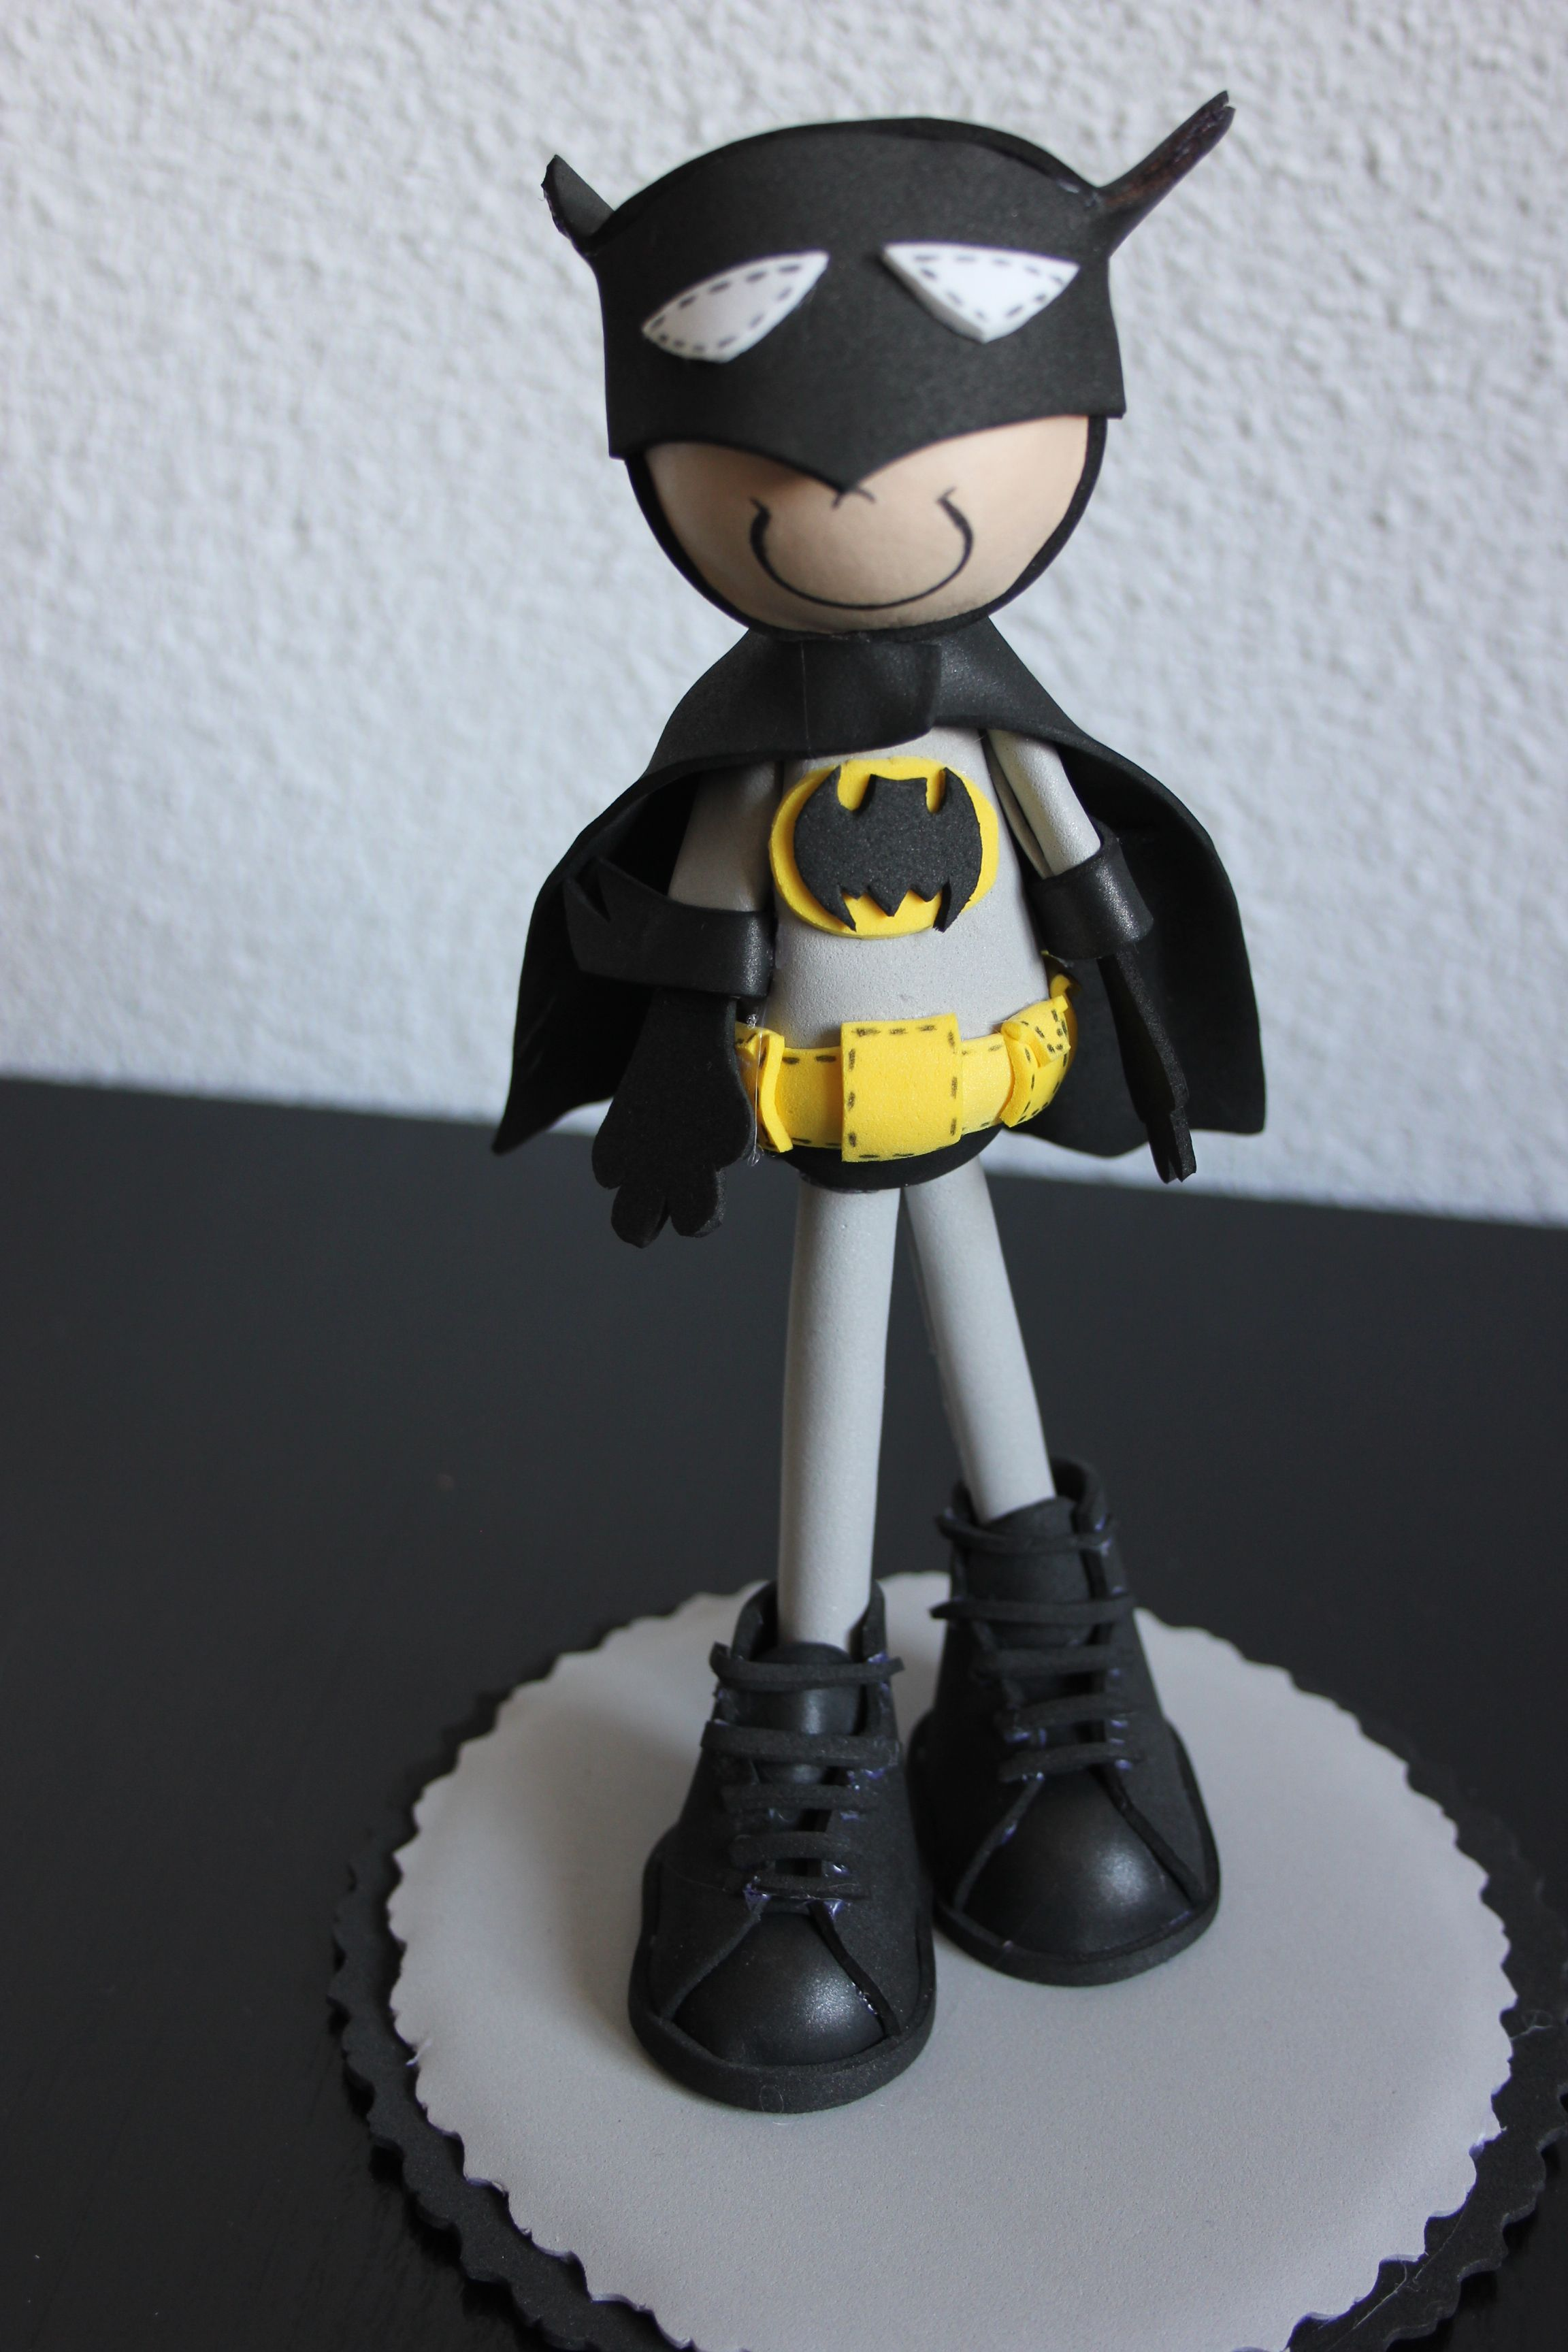 Súper Héroe, Batman. El Taller del Minino.